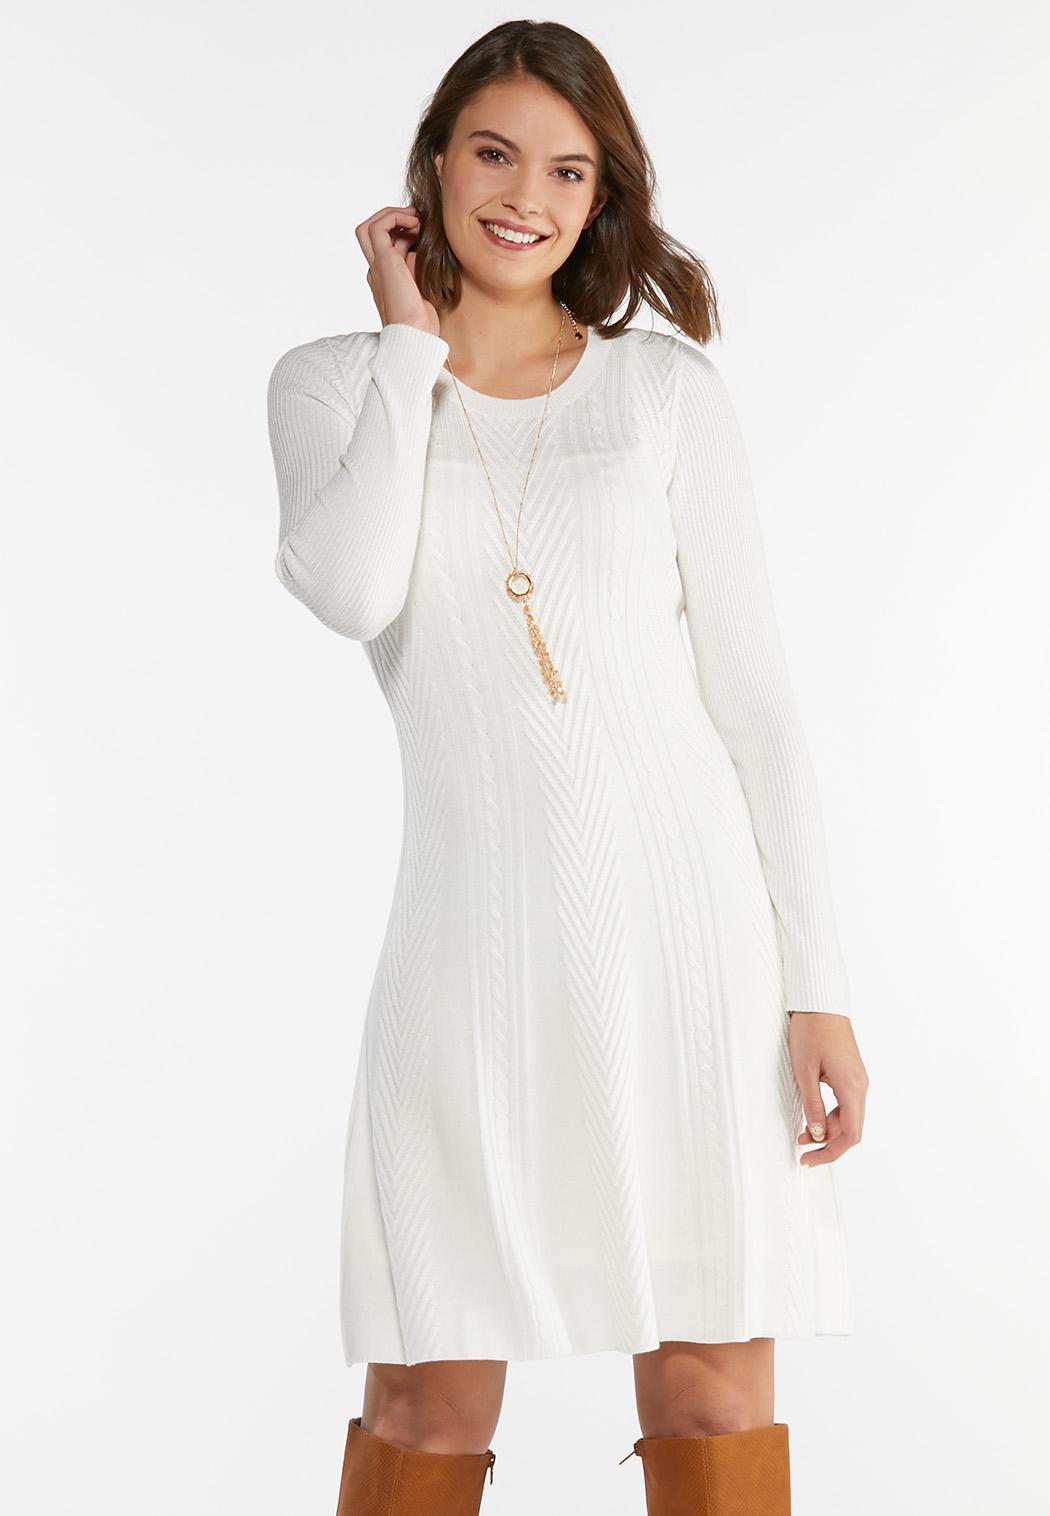 Plus Size Ivory Knit Sweater Dress